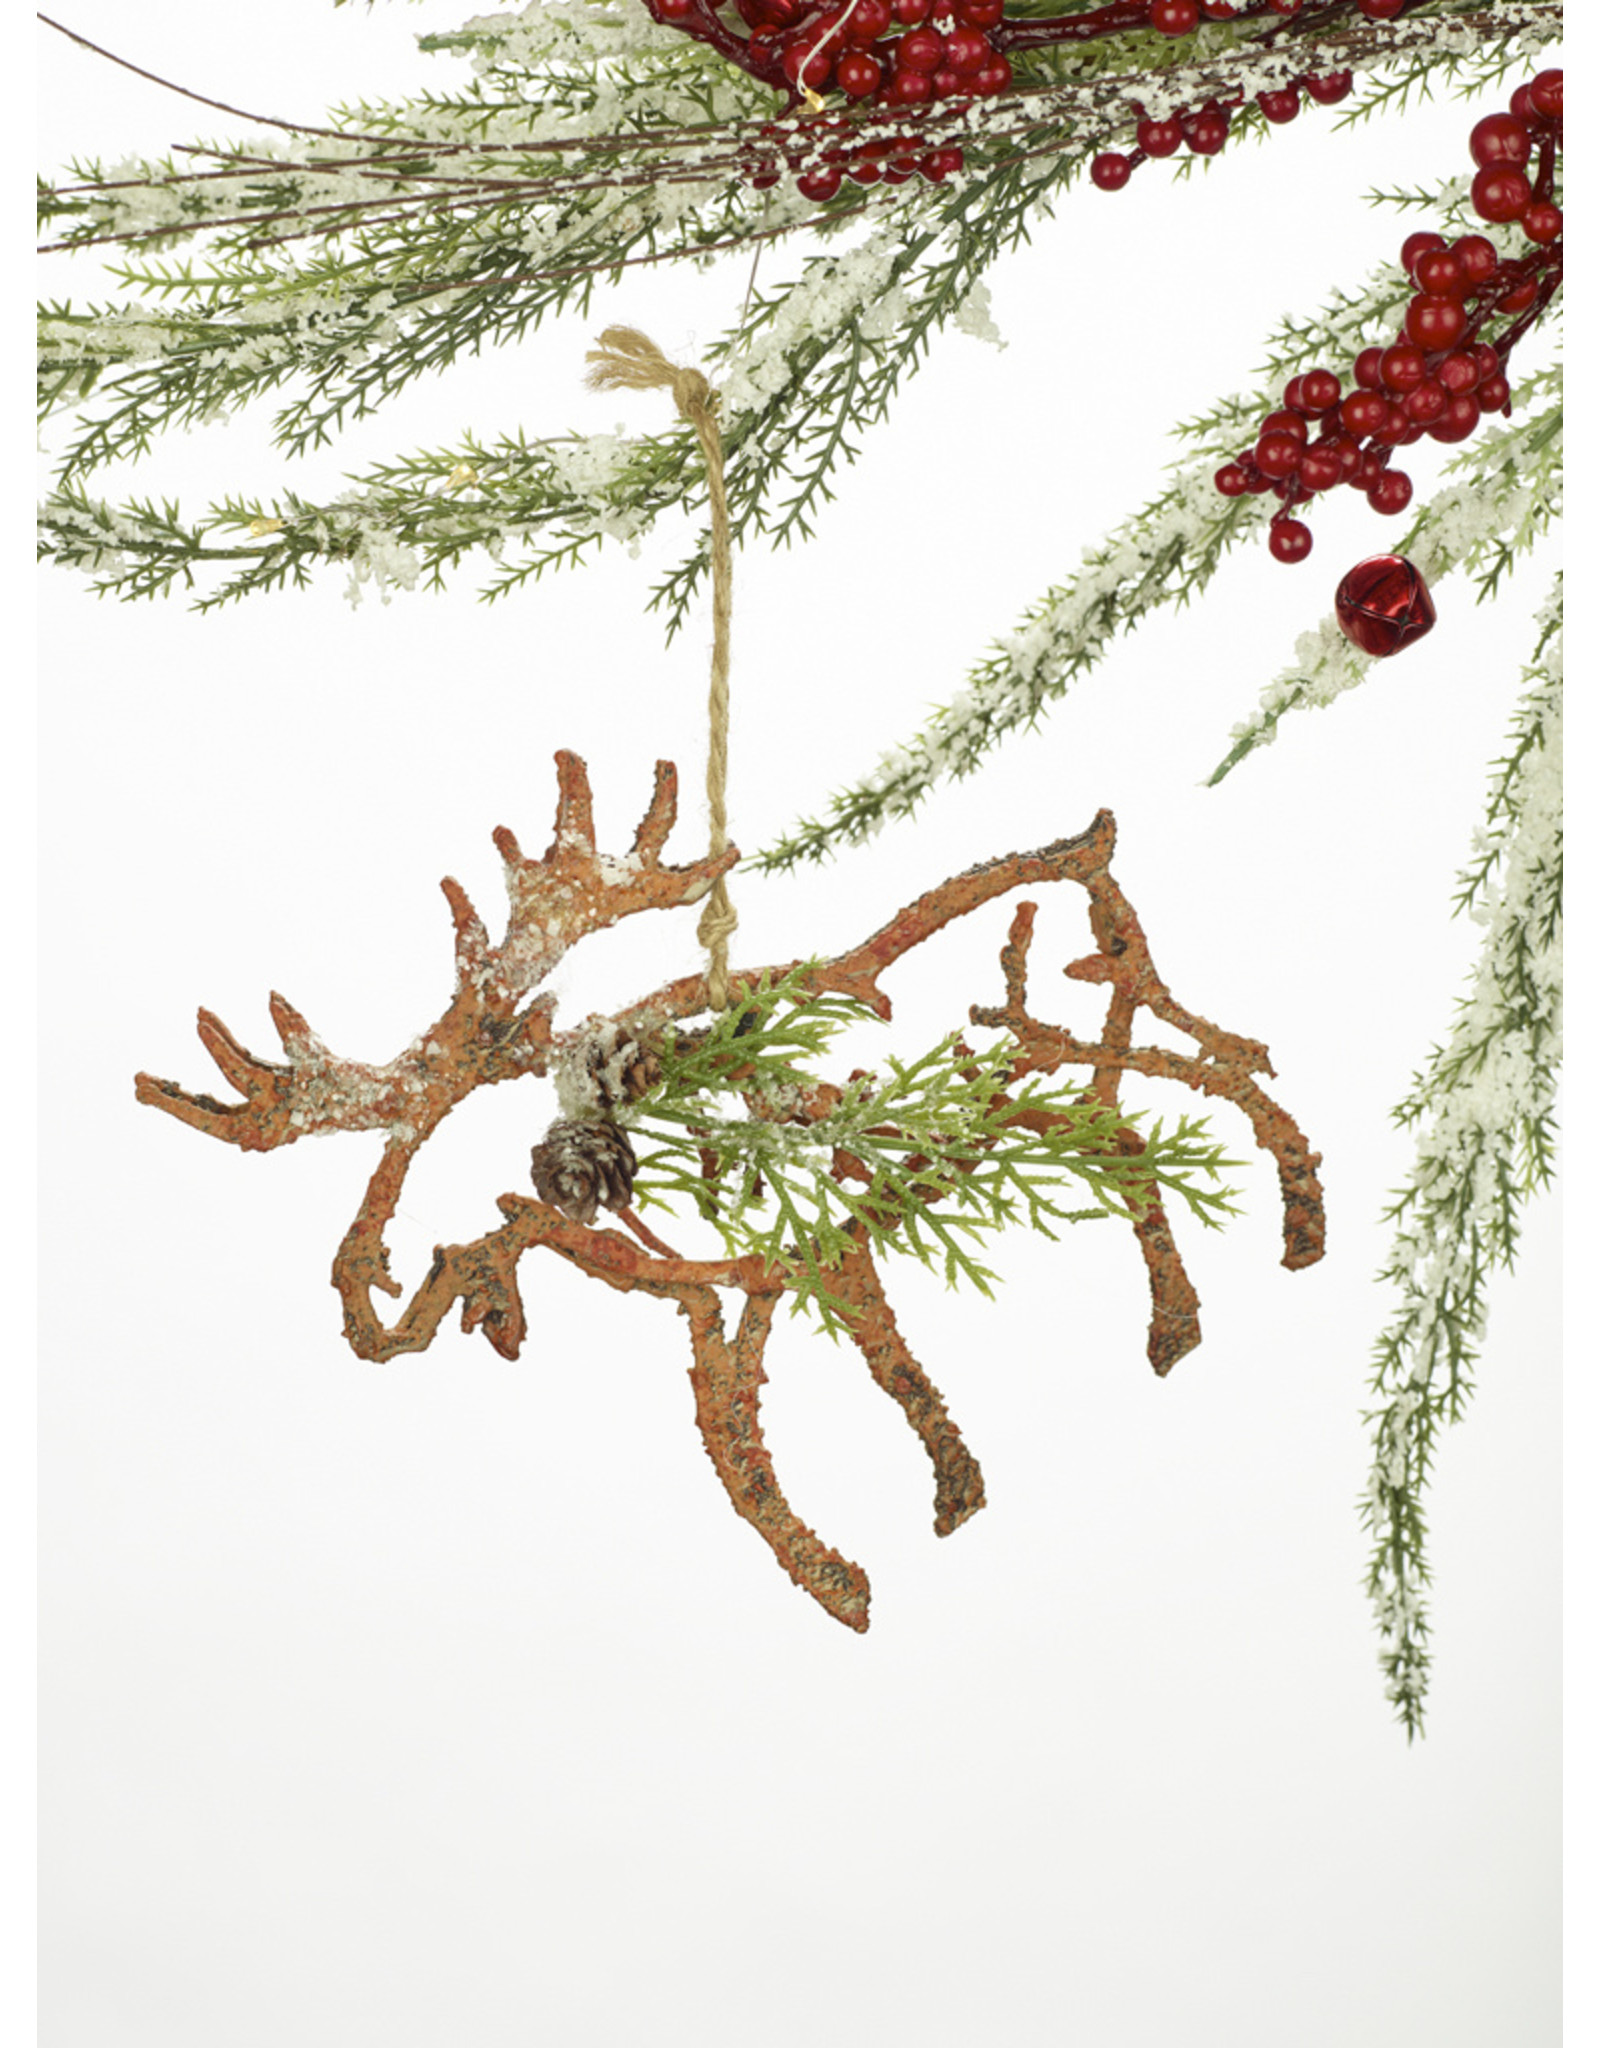 Rustic Lodge Ornament